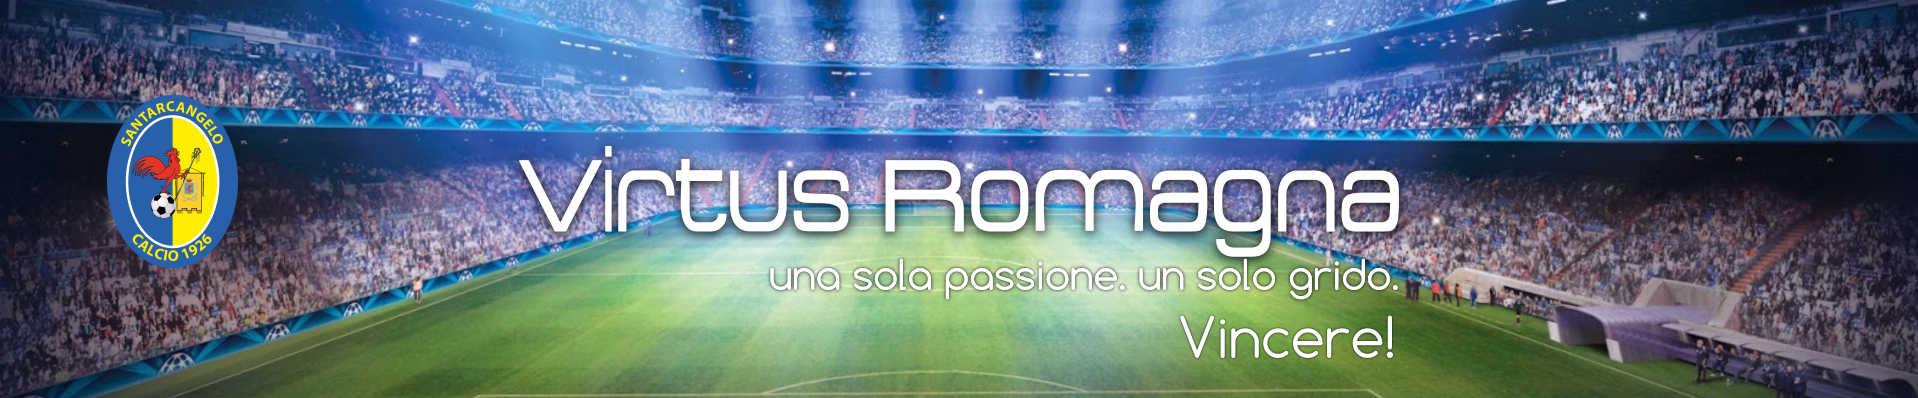 ACDF Virtus Romagna-Banner